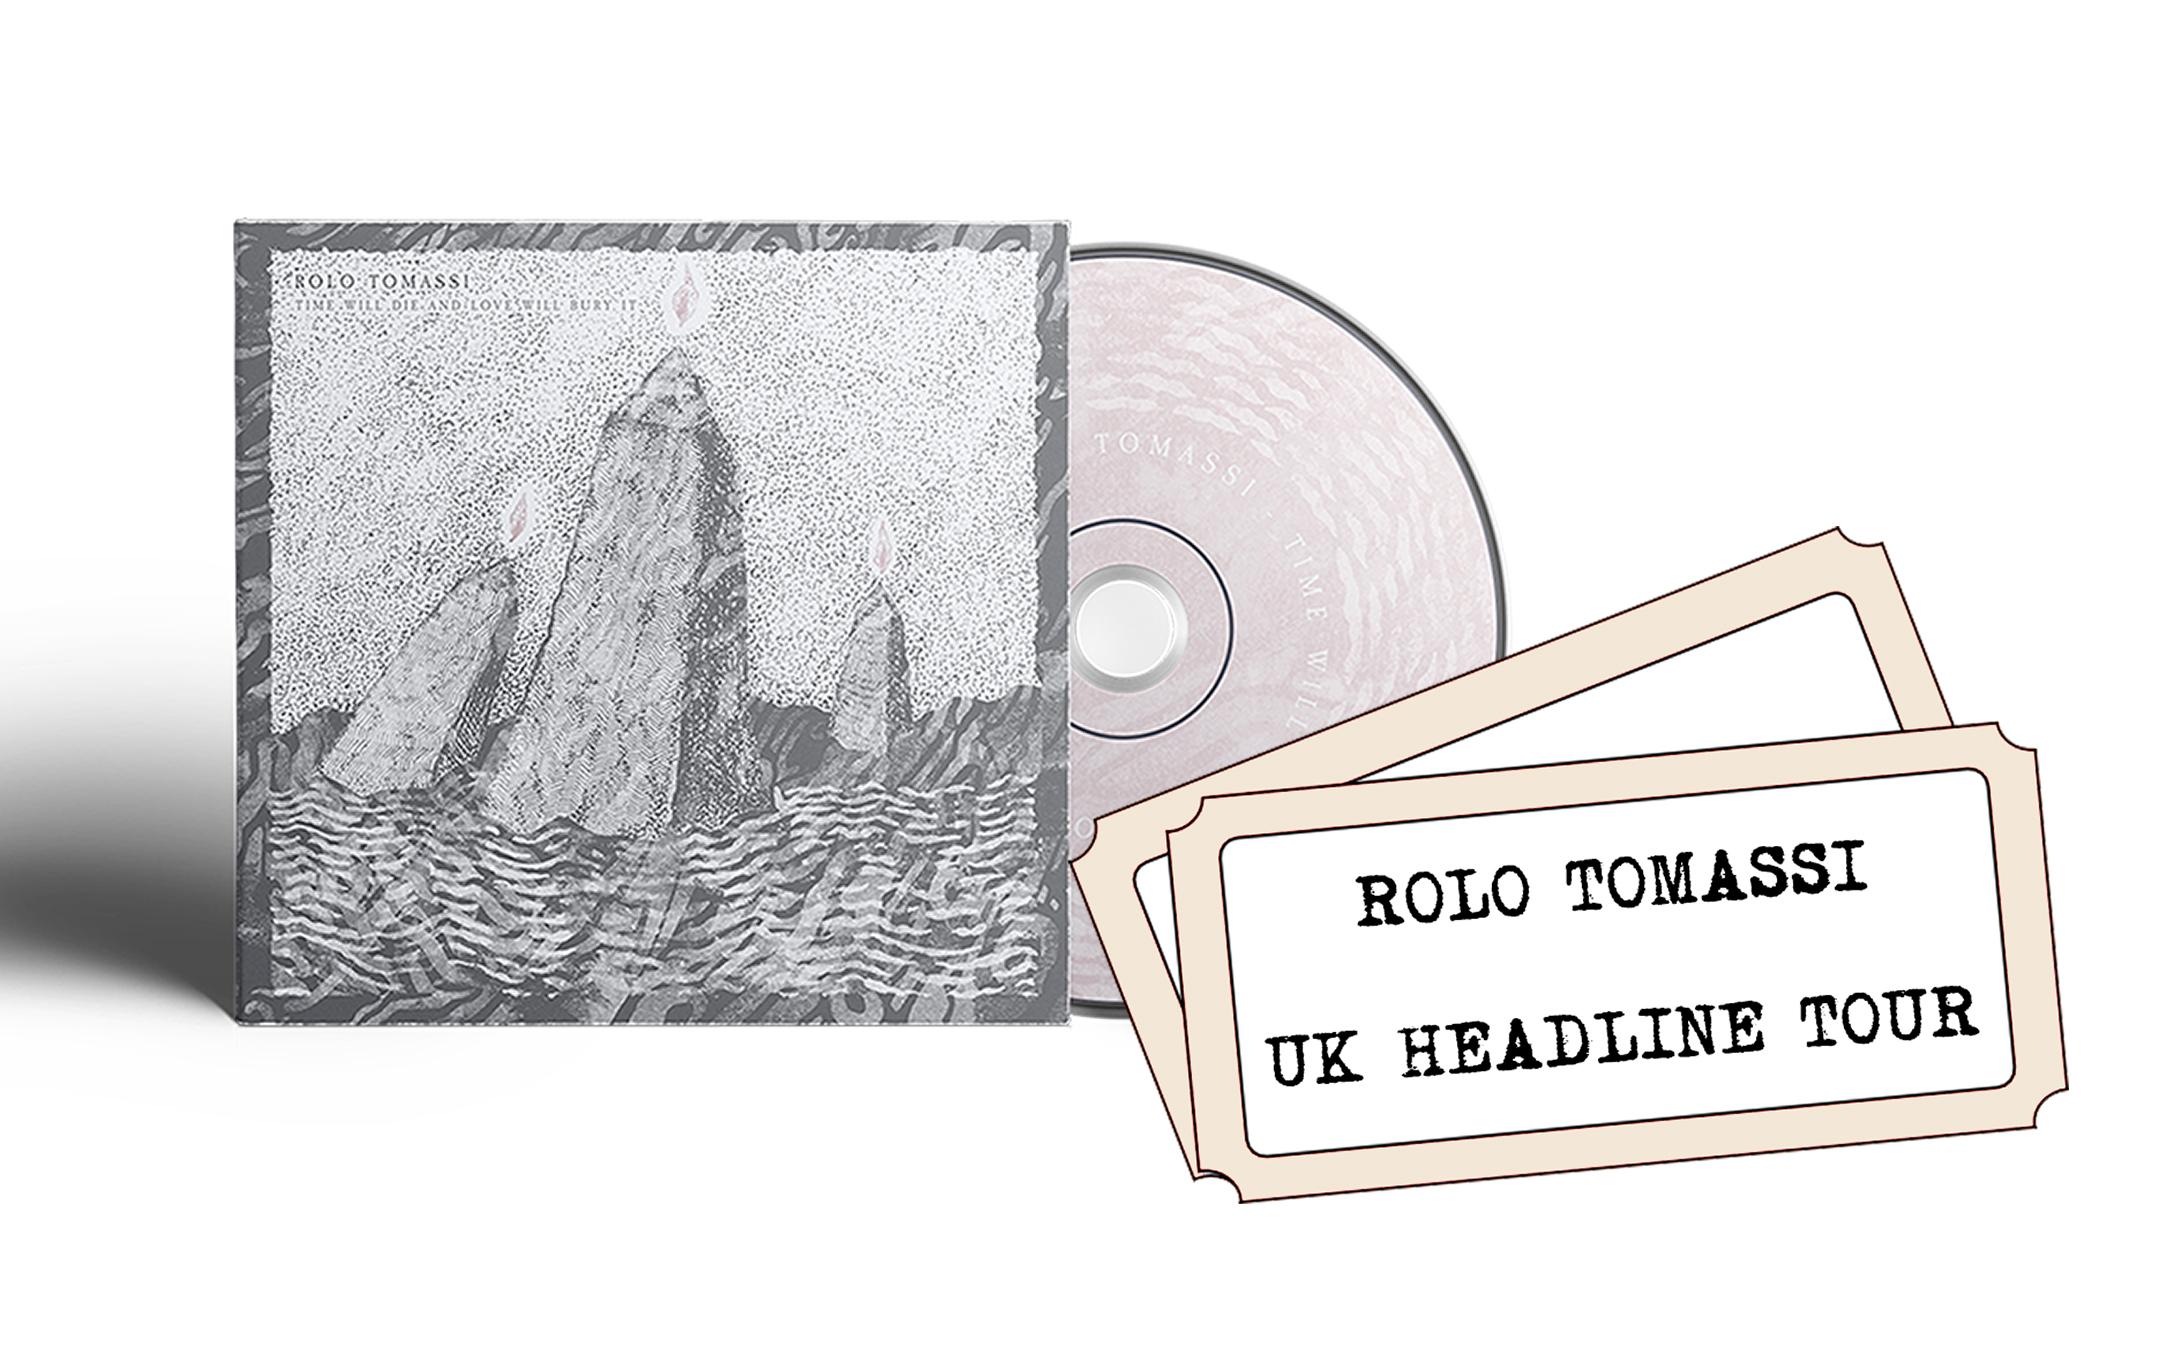 Rolo Tomassi - '...Love Will Bury It' CD + UK headline show ticket PREORDER